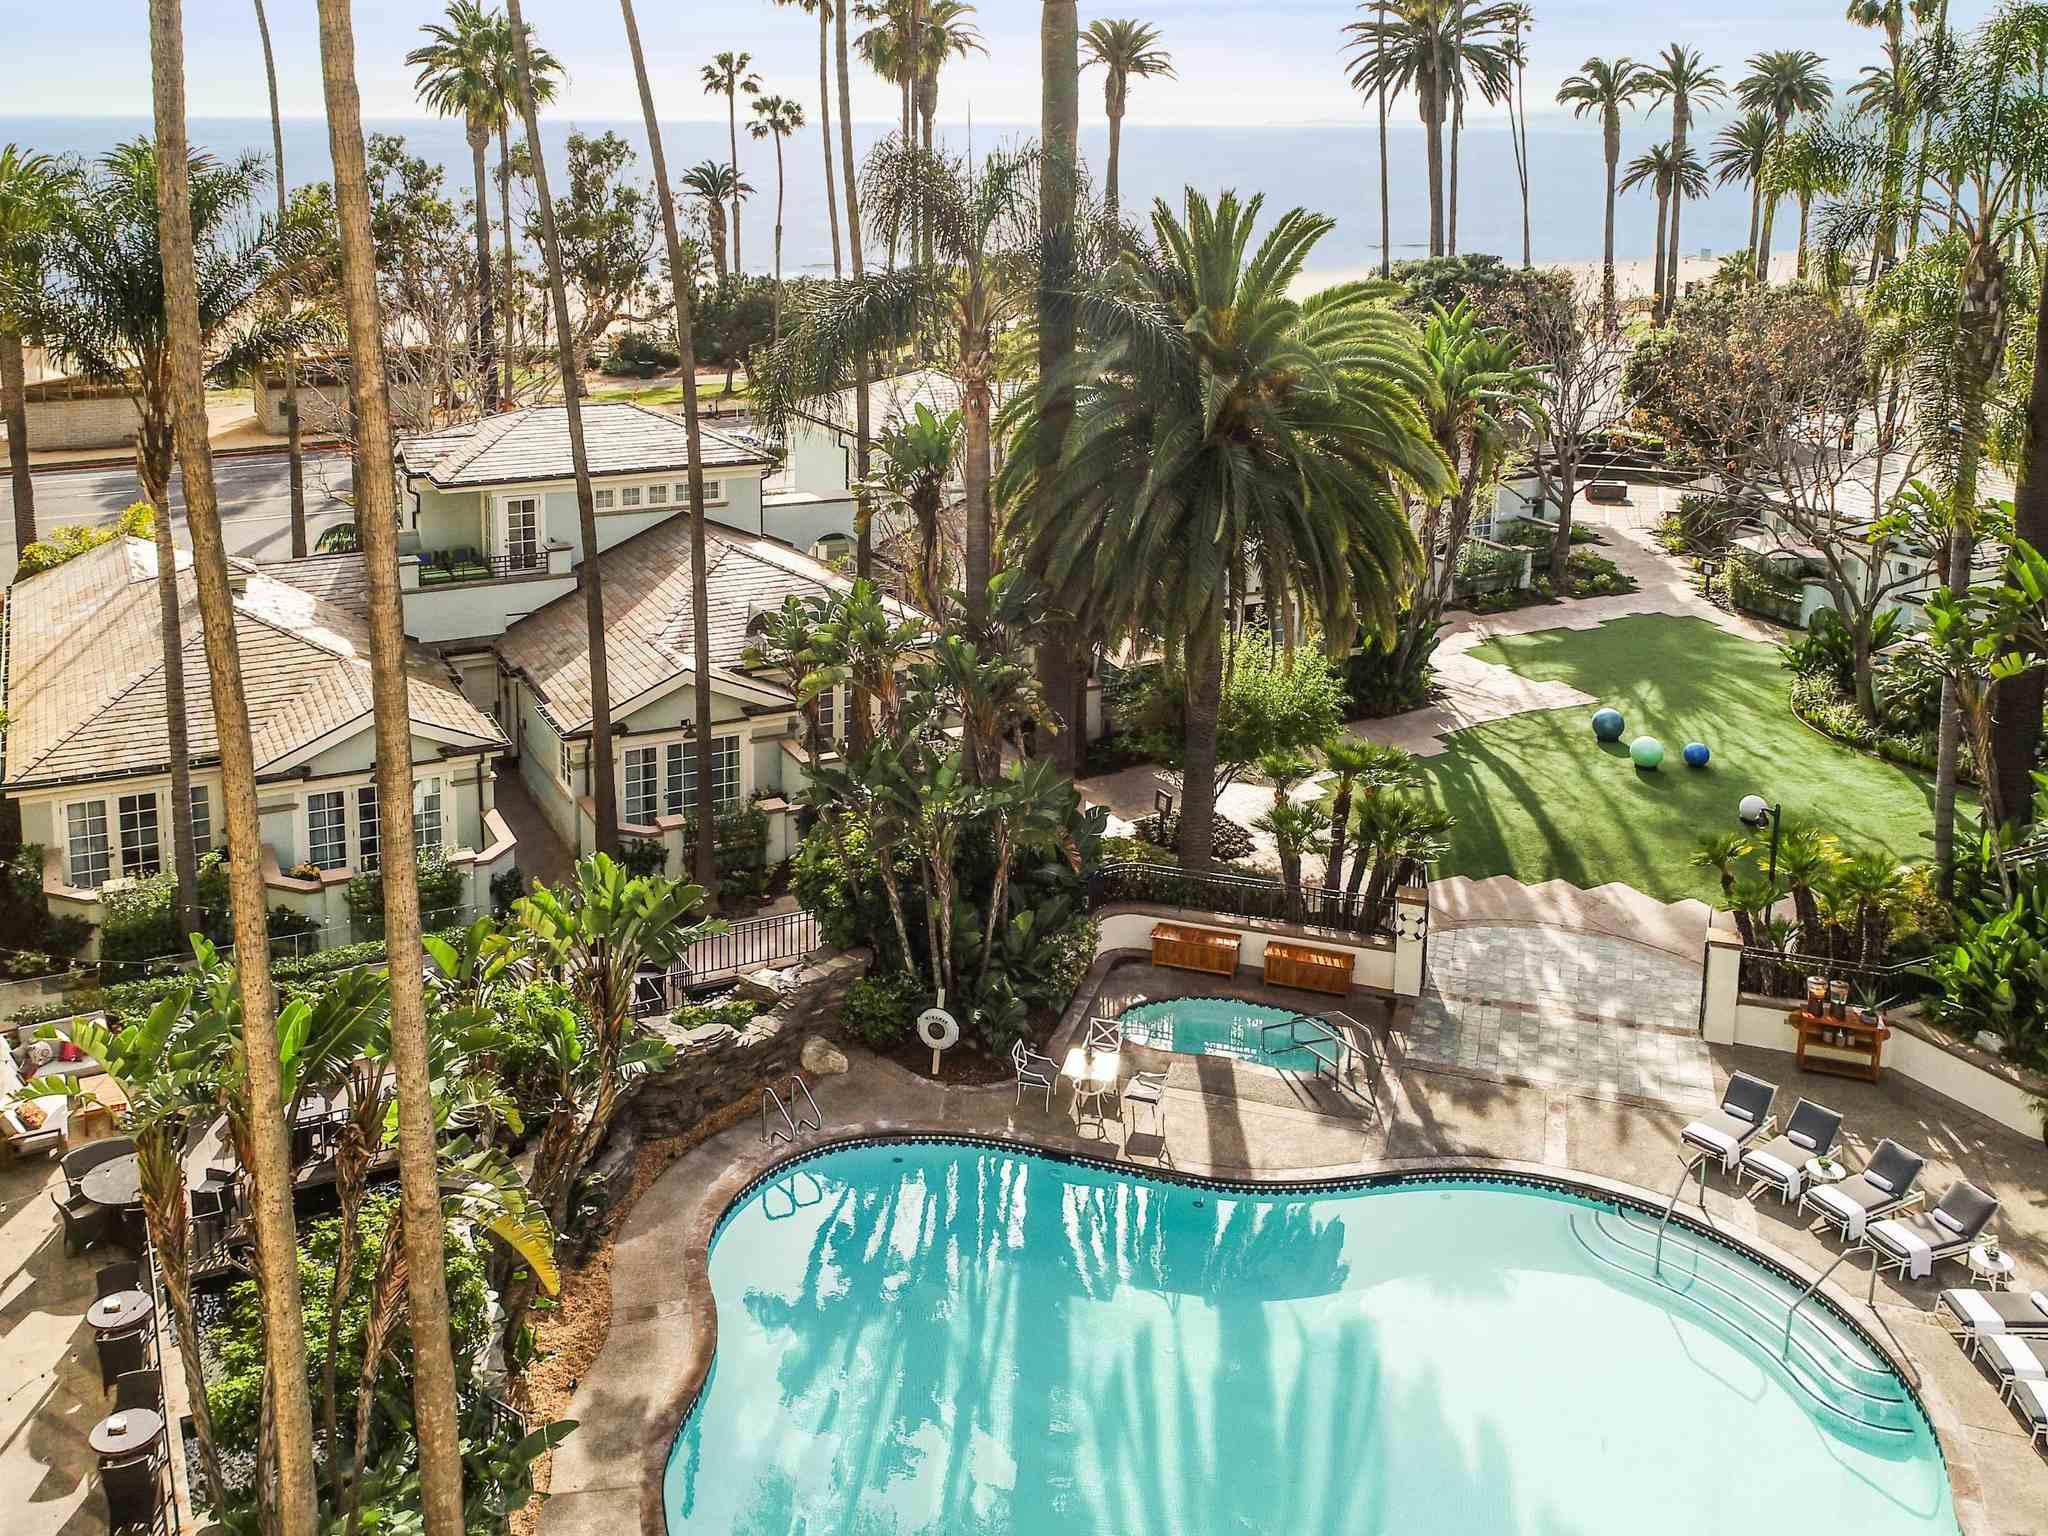 酒店 – Fairmont Miramar Hotel & Bungalows